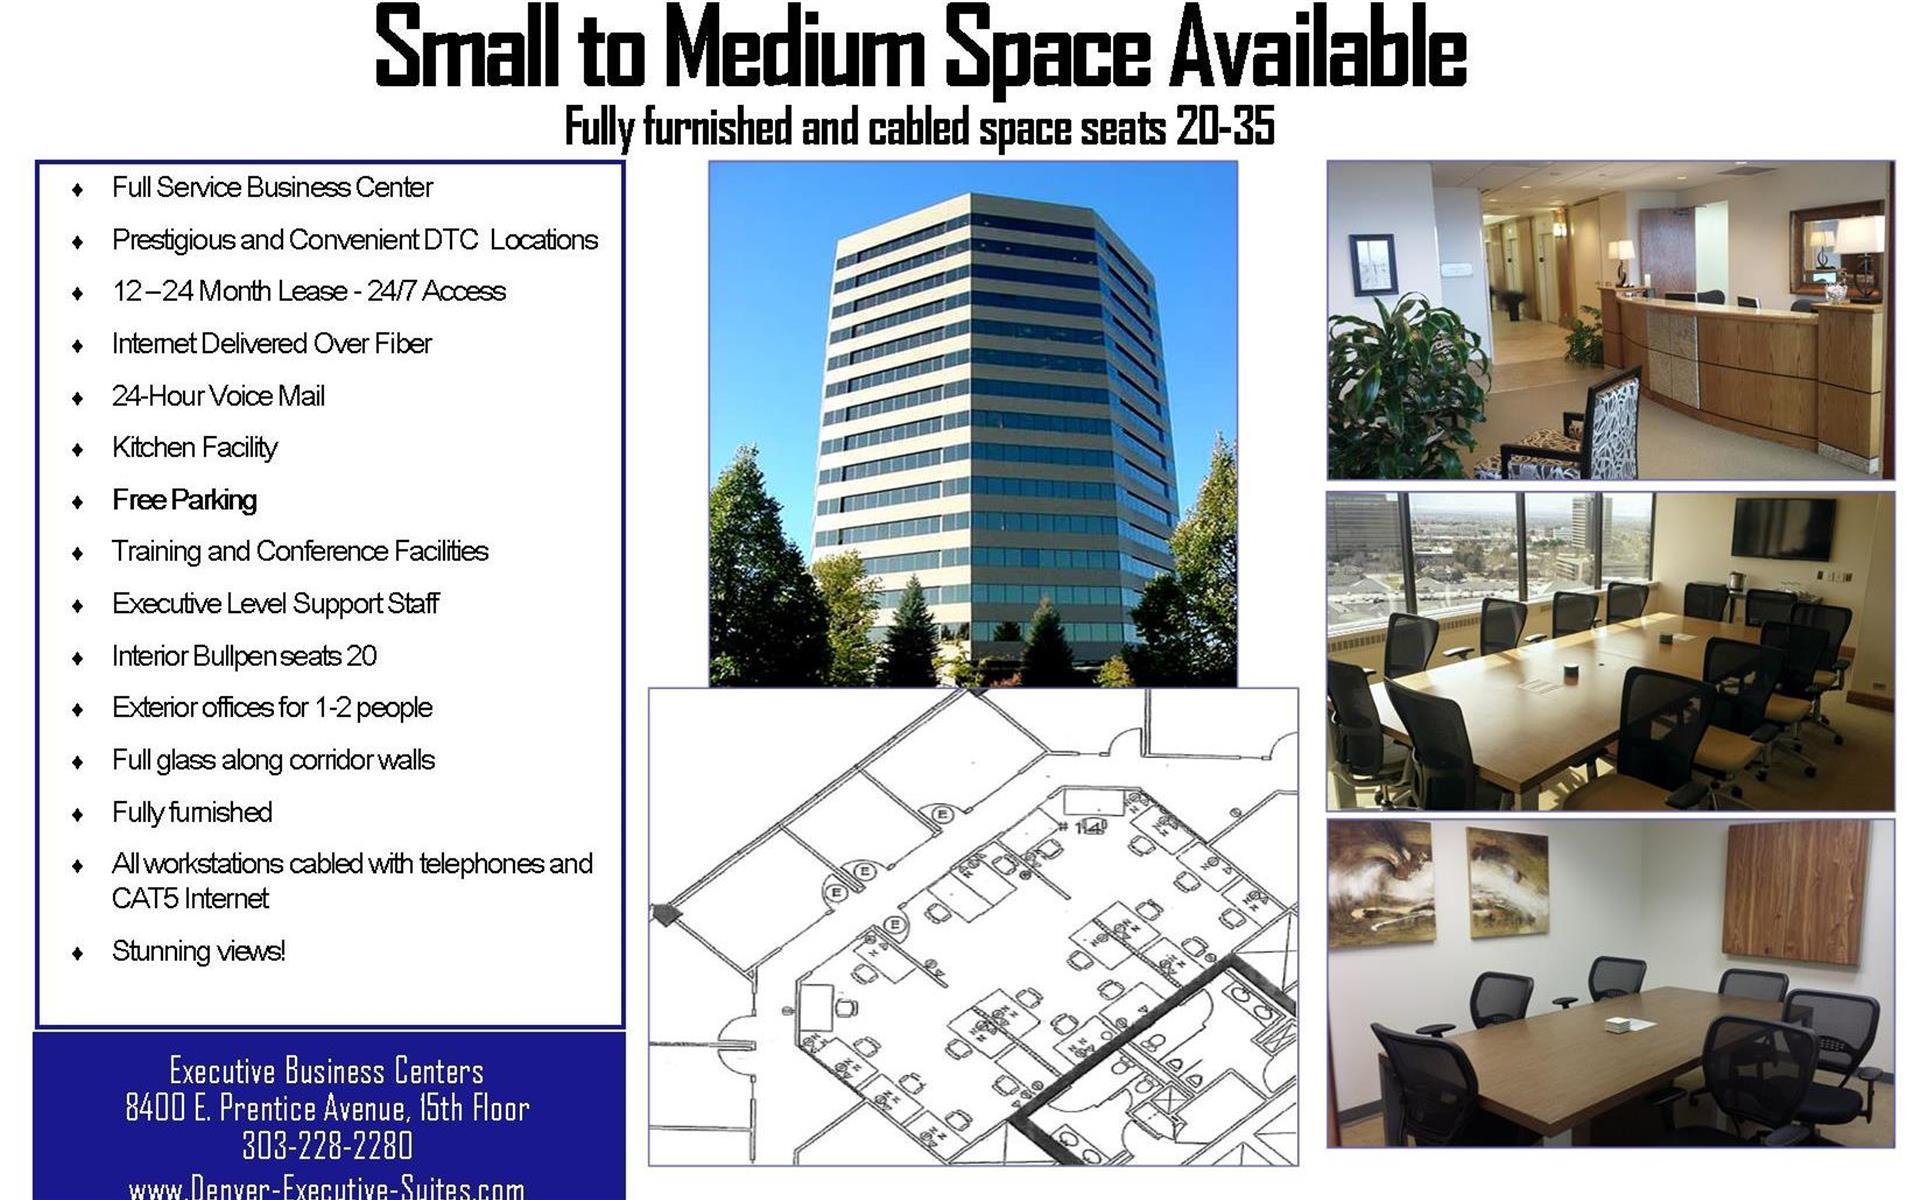 Executive Business Centers Denver Tech Center - Large Team Space for 20